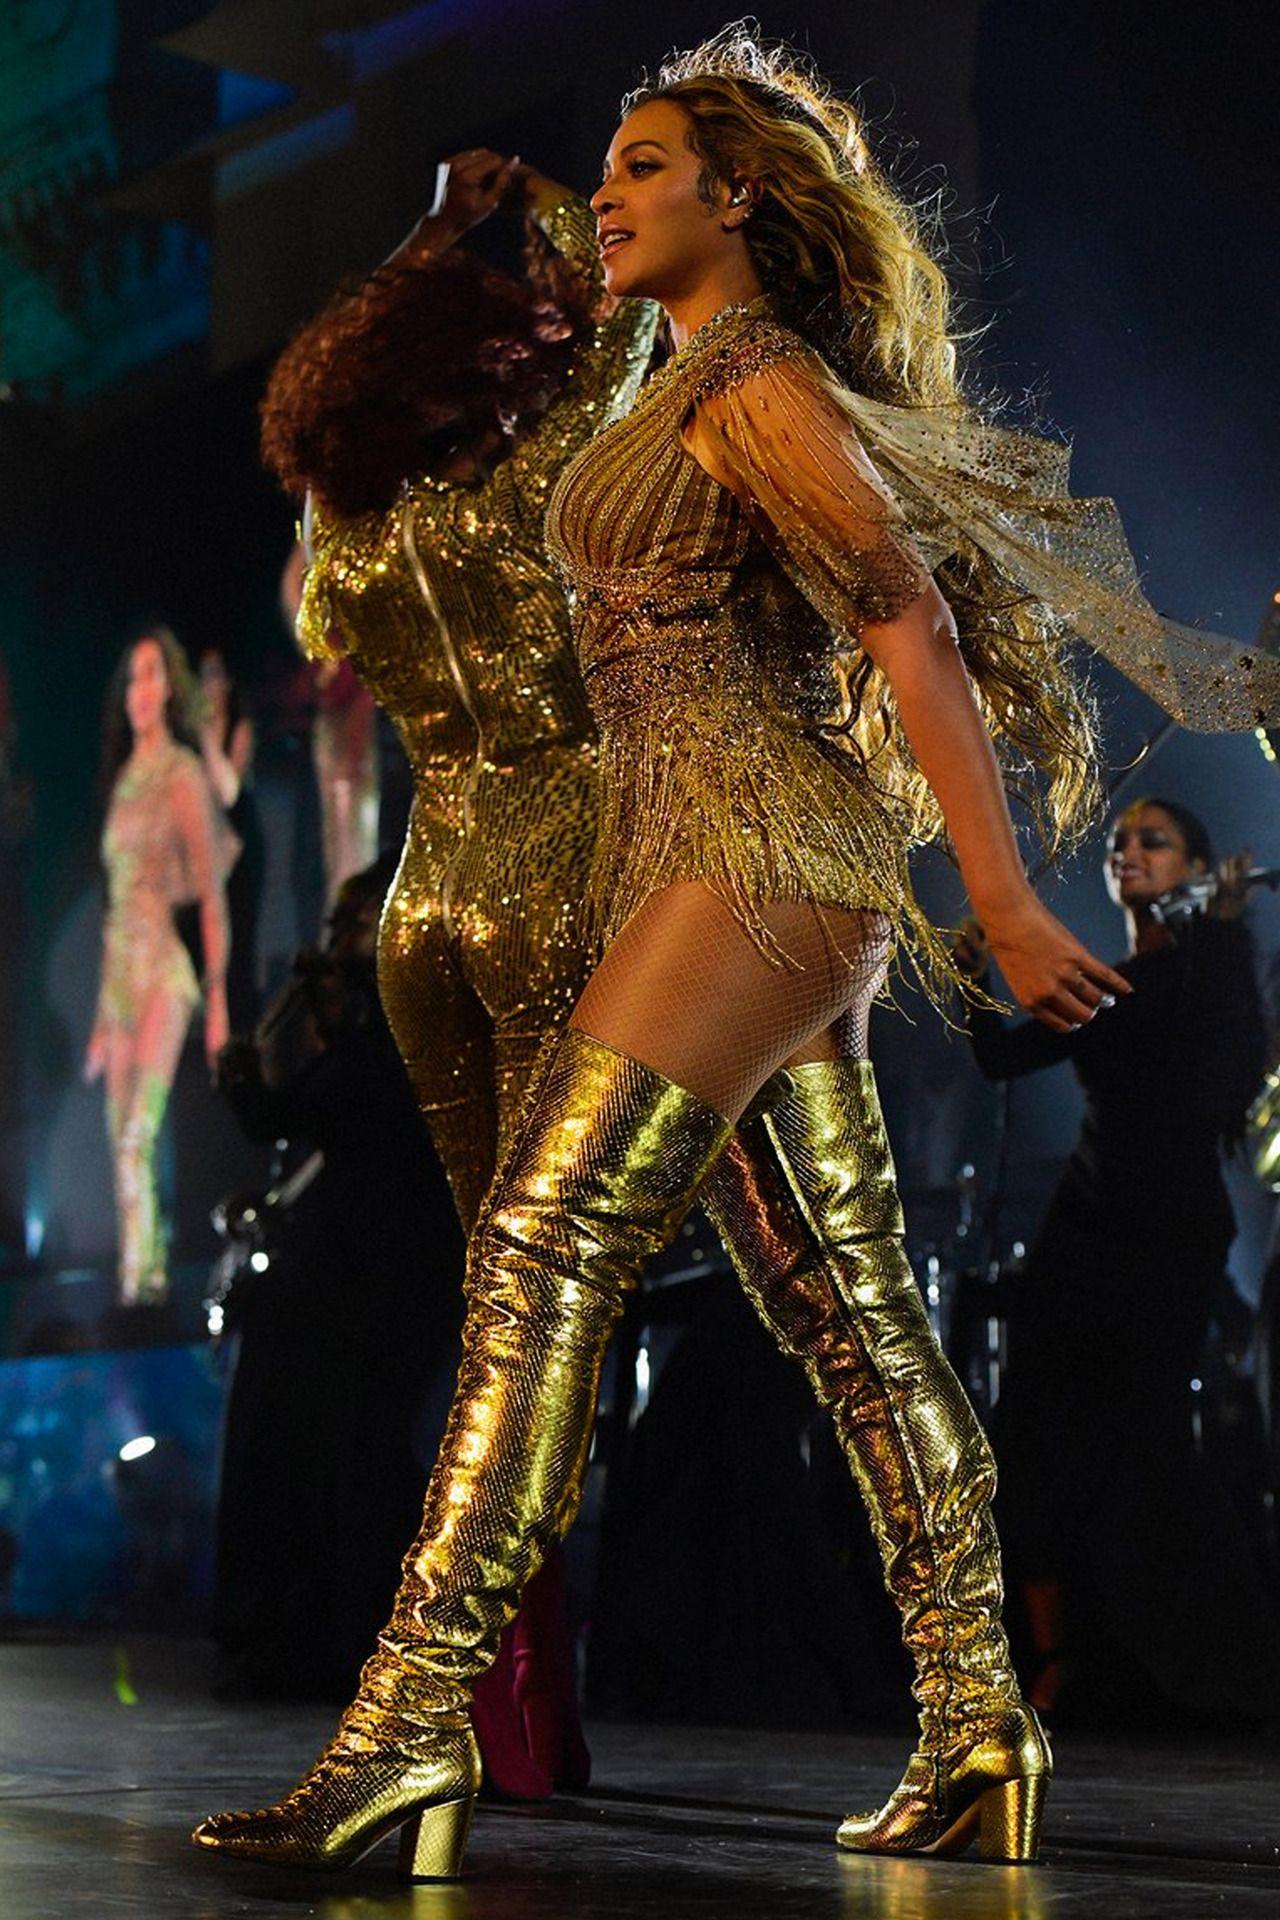 435a95b0a2d2 Beyoncé Udaipur India 🇮🇳 9th December 2018